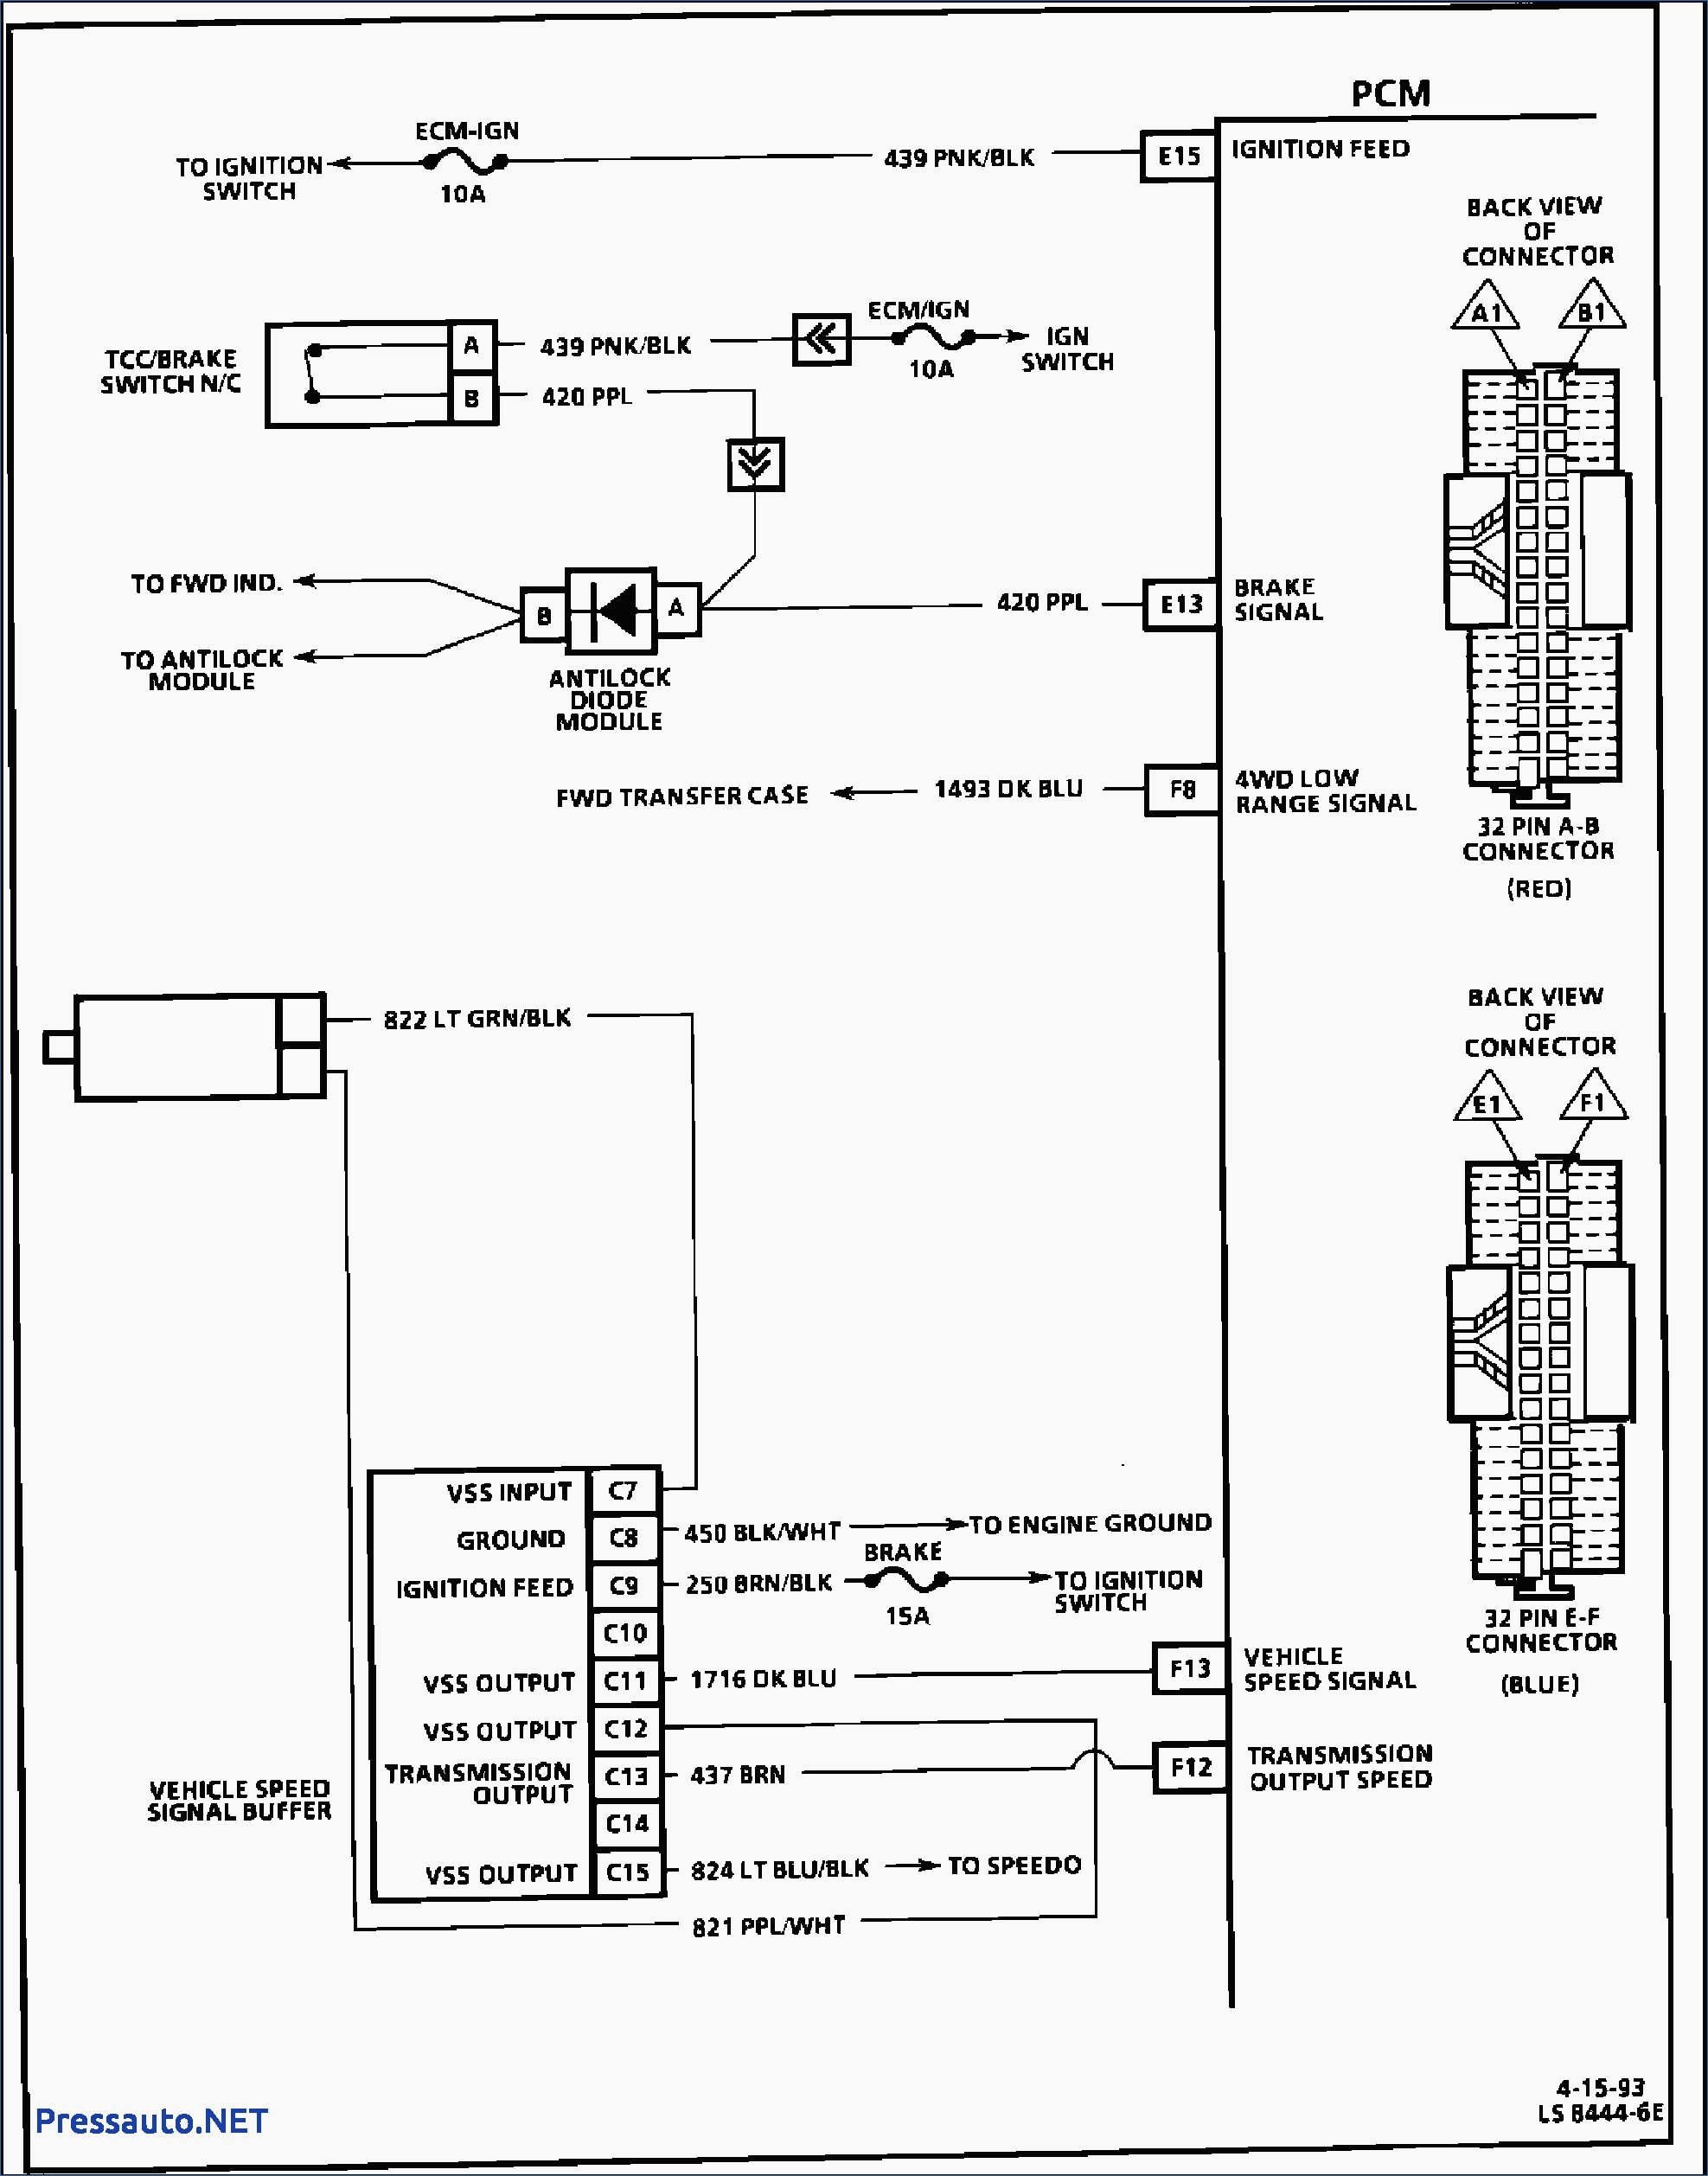 4l60e Wiring Harness Diagram Luxury 4l60e Wiring Harness Diagram Luxury 4l80e Wiring Diagram &